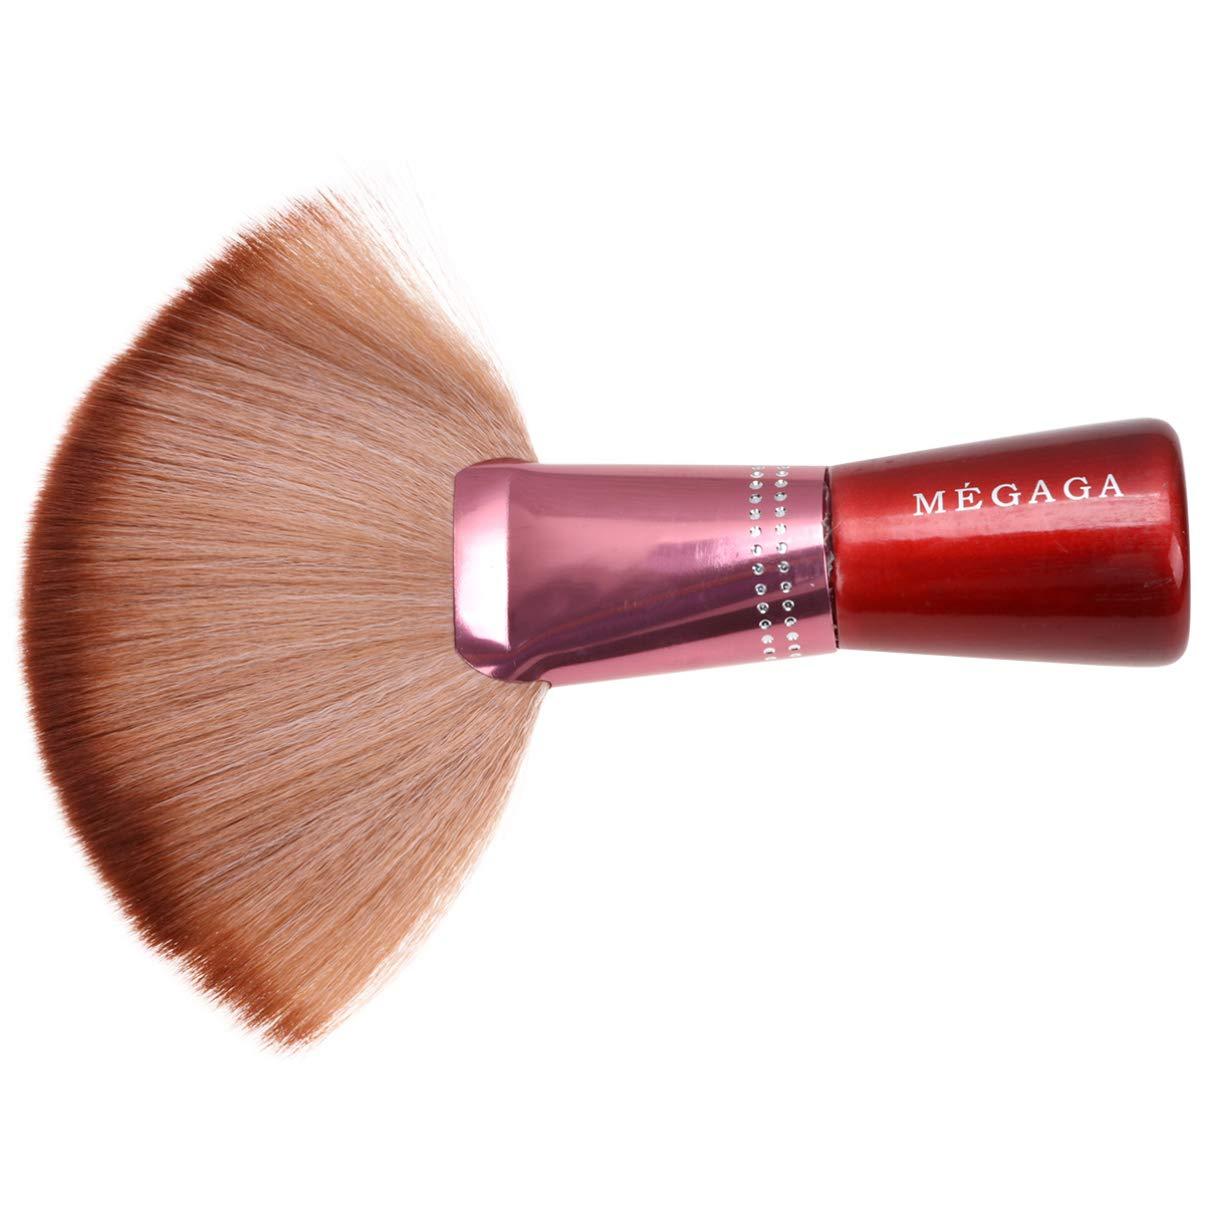 Minkissy Fan Shape Brushes Acrylic Powder Found Foundation Brush Max 52% OFF Dealing full price reduction